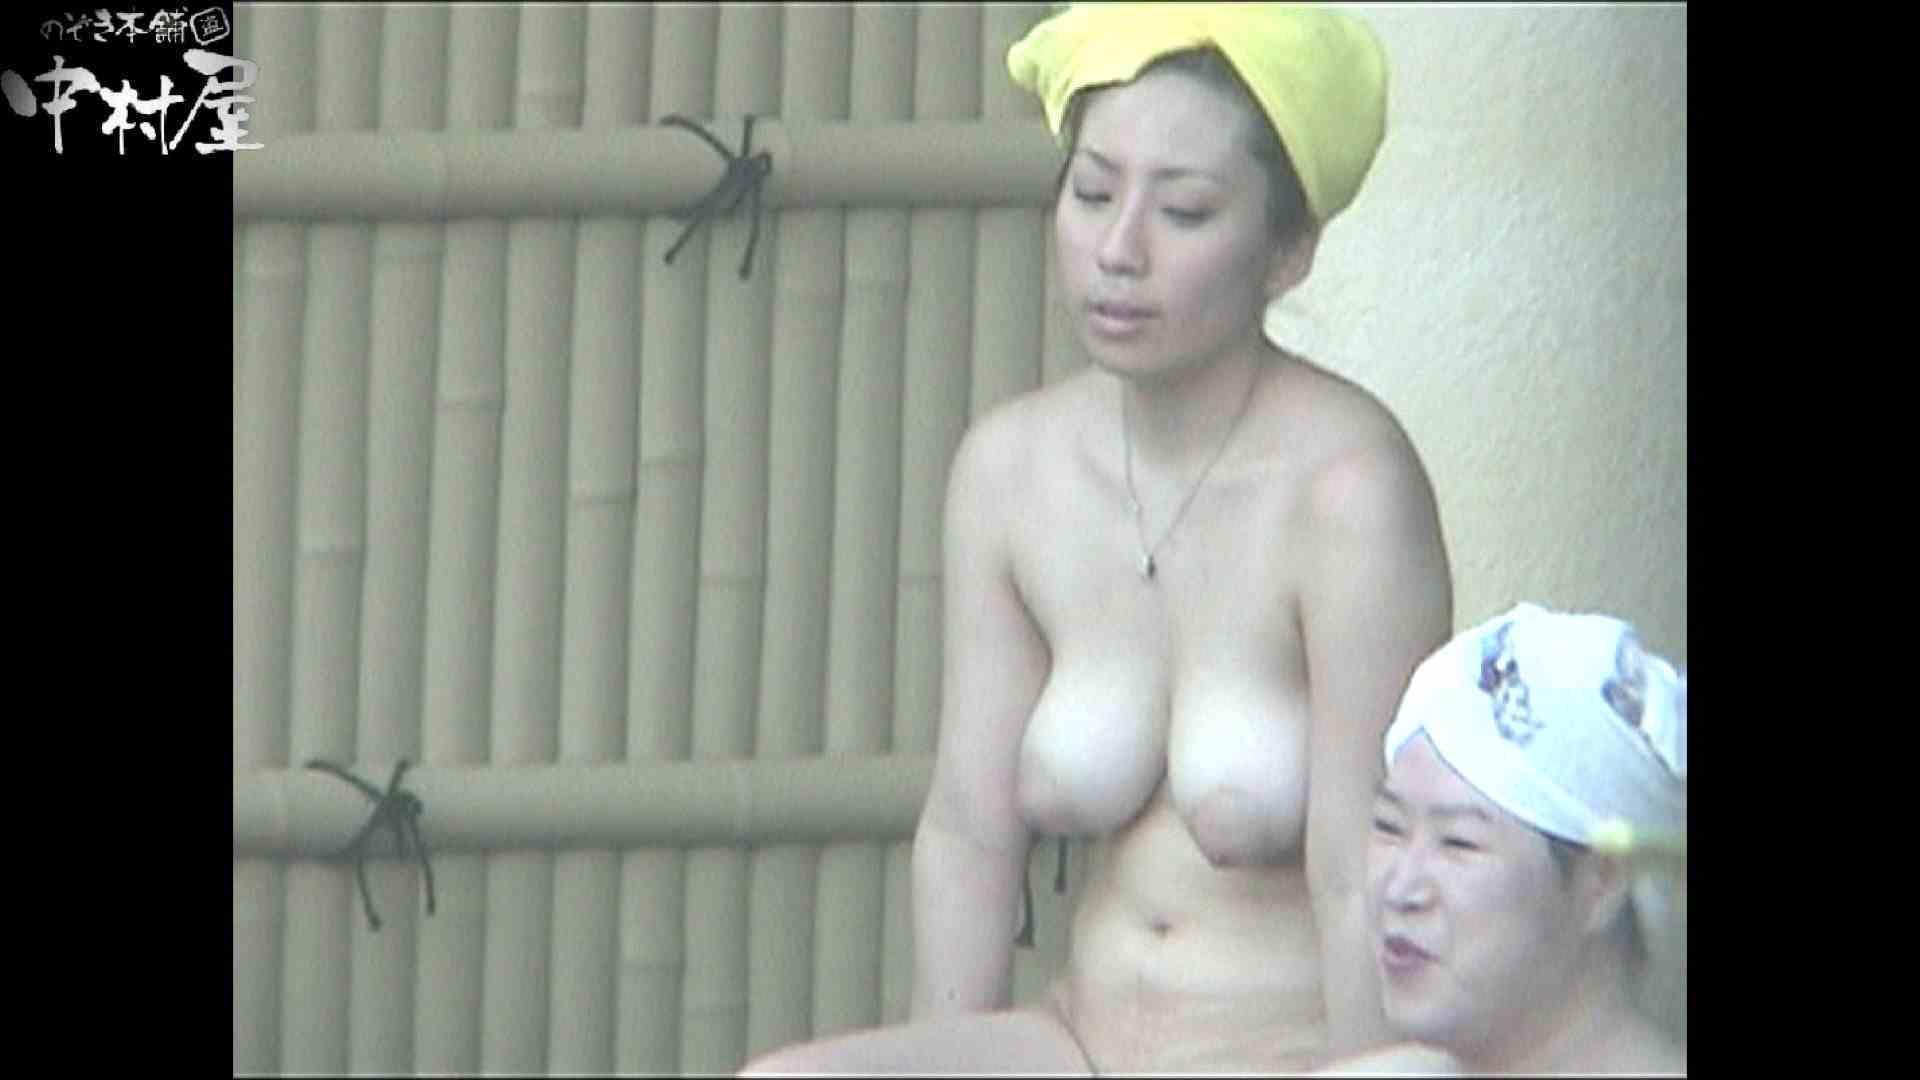 Aquaな露天風呂Vol.902 盗撮師作品 | 露天風呂突入  104pic 49